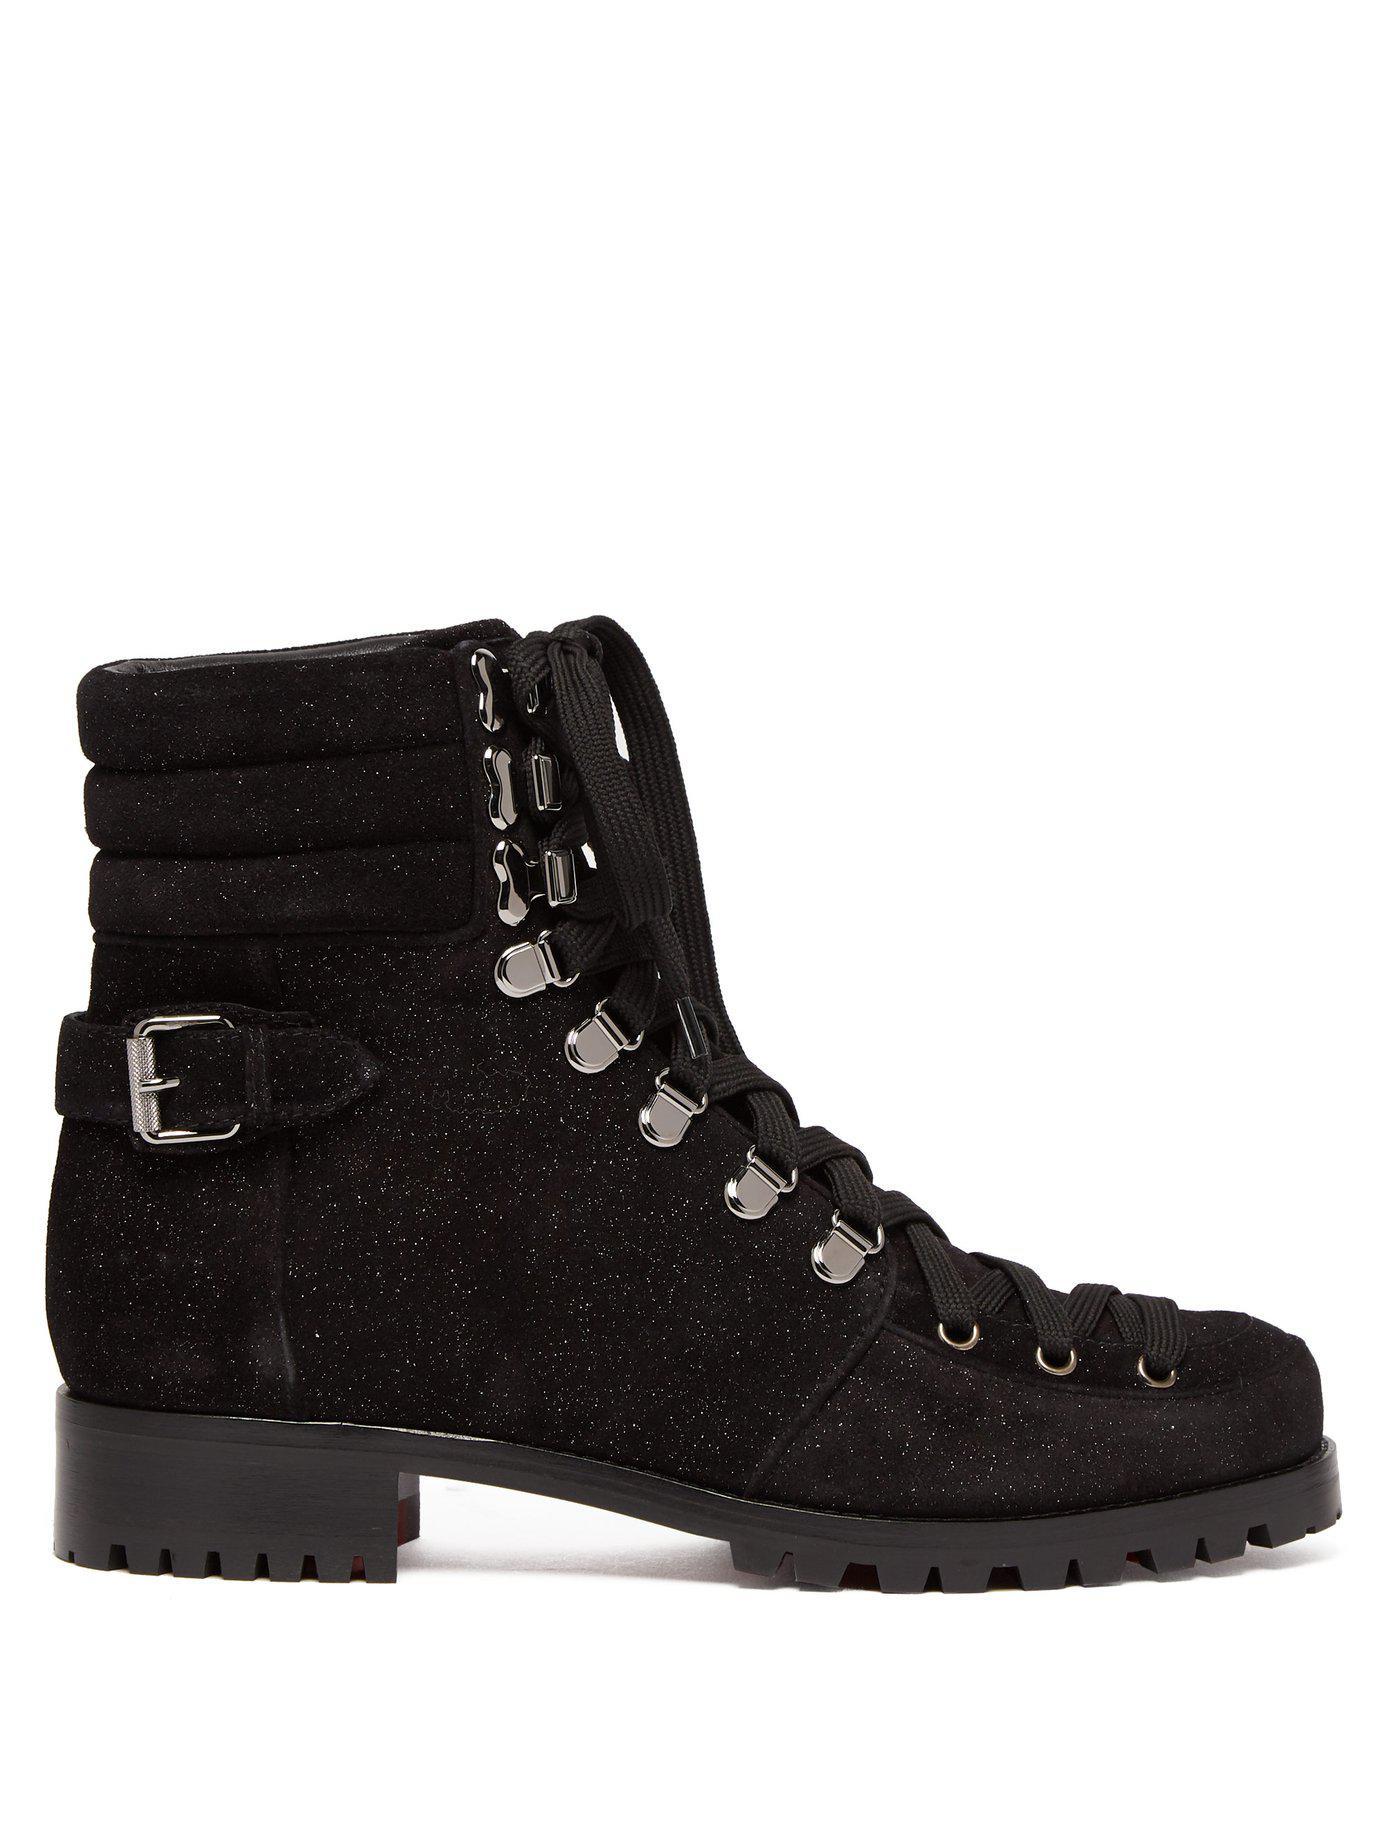 size 40 d9a54 d2c81 Women's Black Who Runs Glitter Suede Hiking Boots